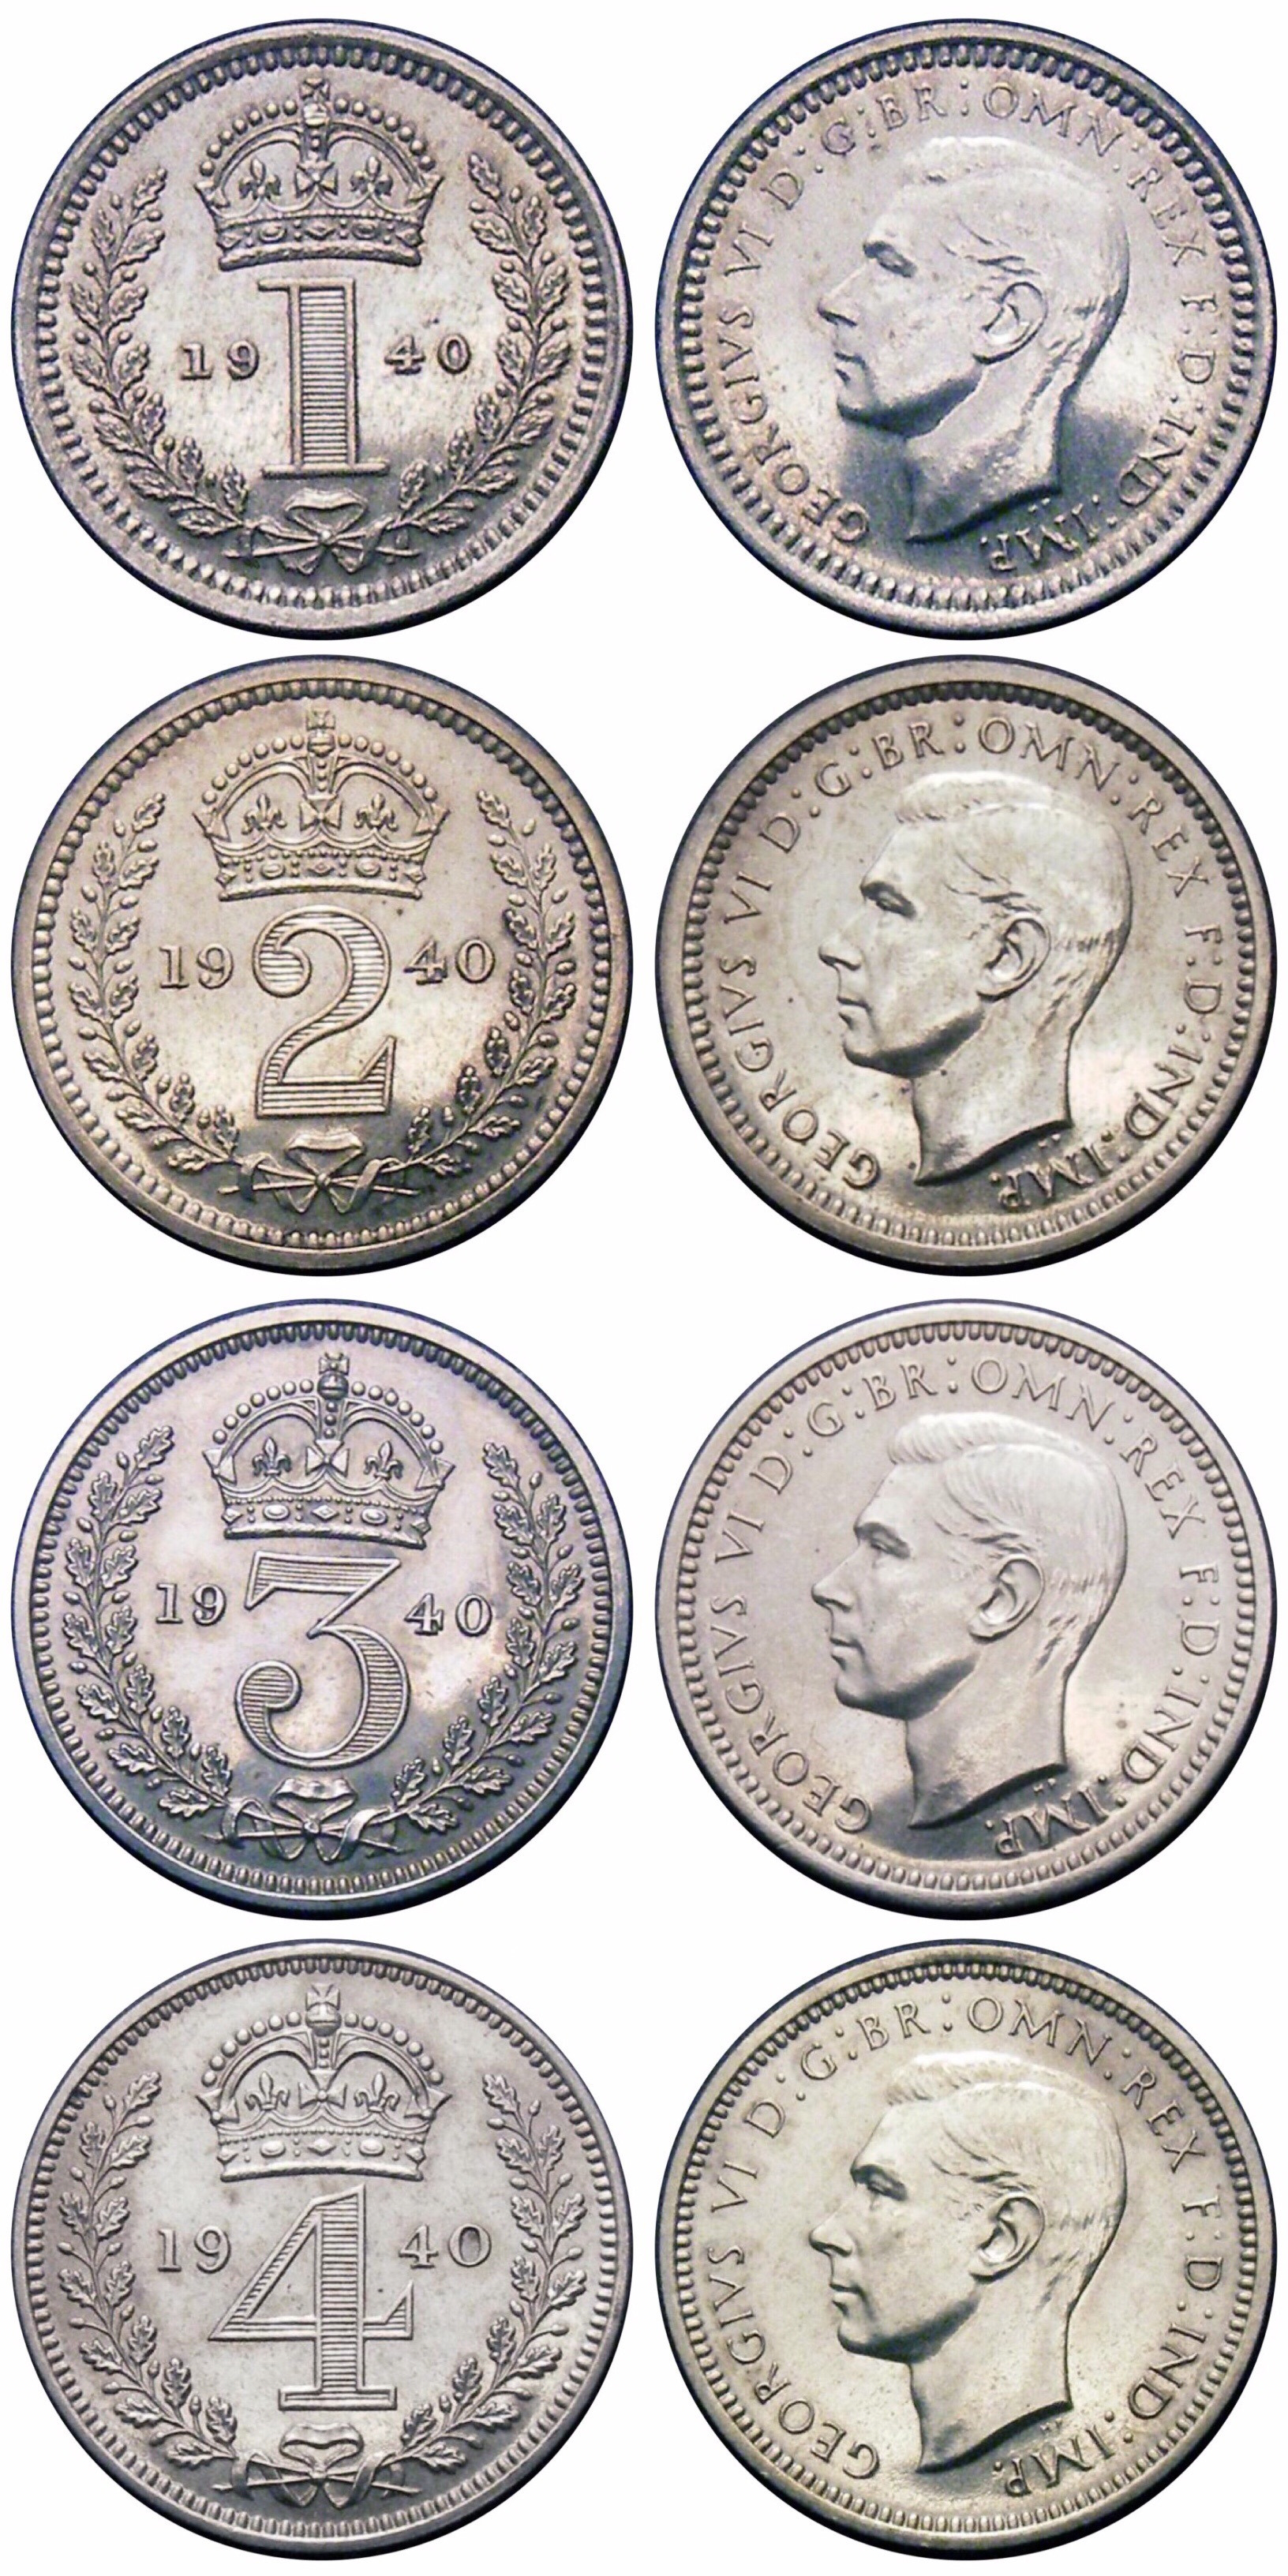 1940 Maundy set, CGS 85 85 85 85, Choice UNC to BU, George VI